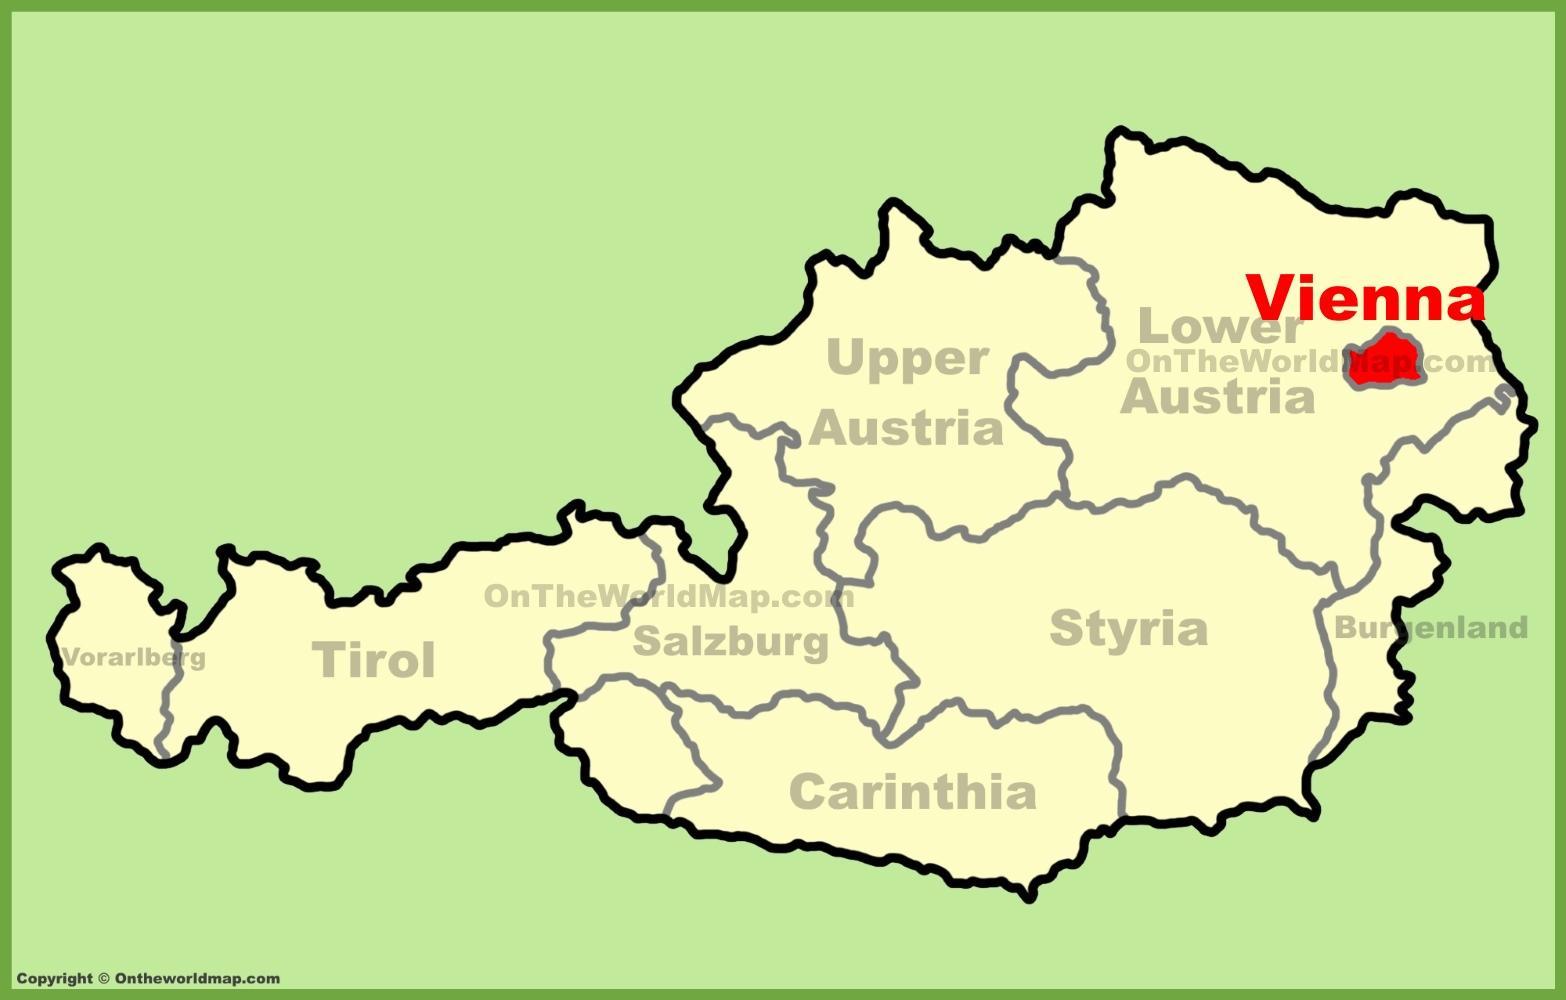 Wien Osterrike Kart Wien Osterrike Kart Osterrike